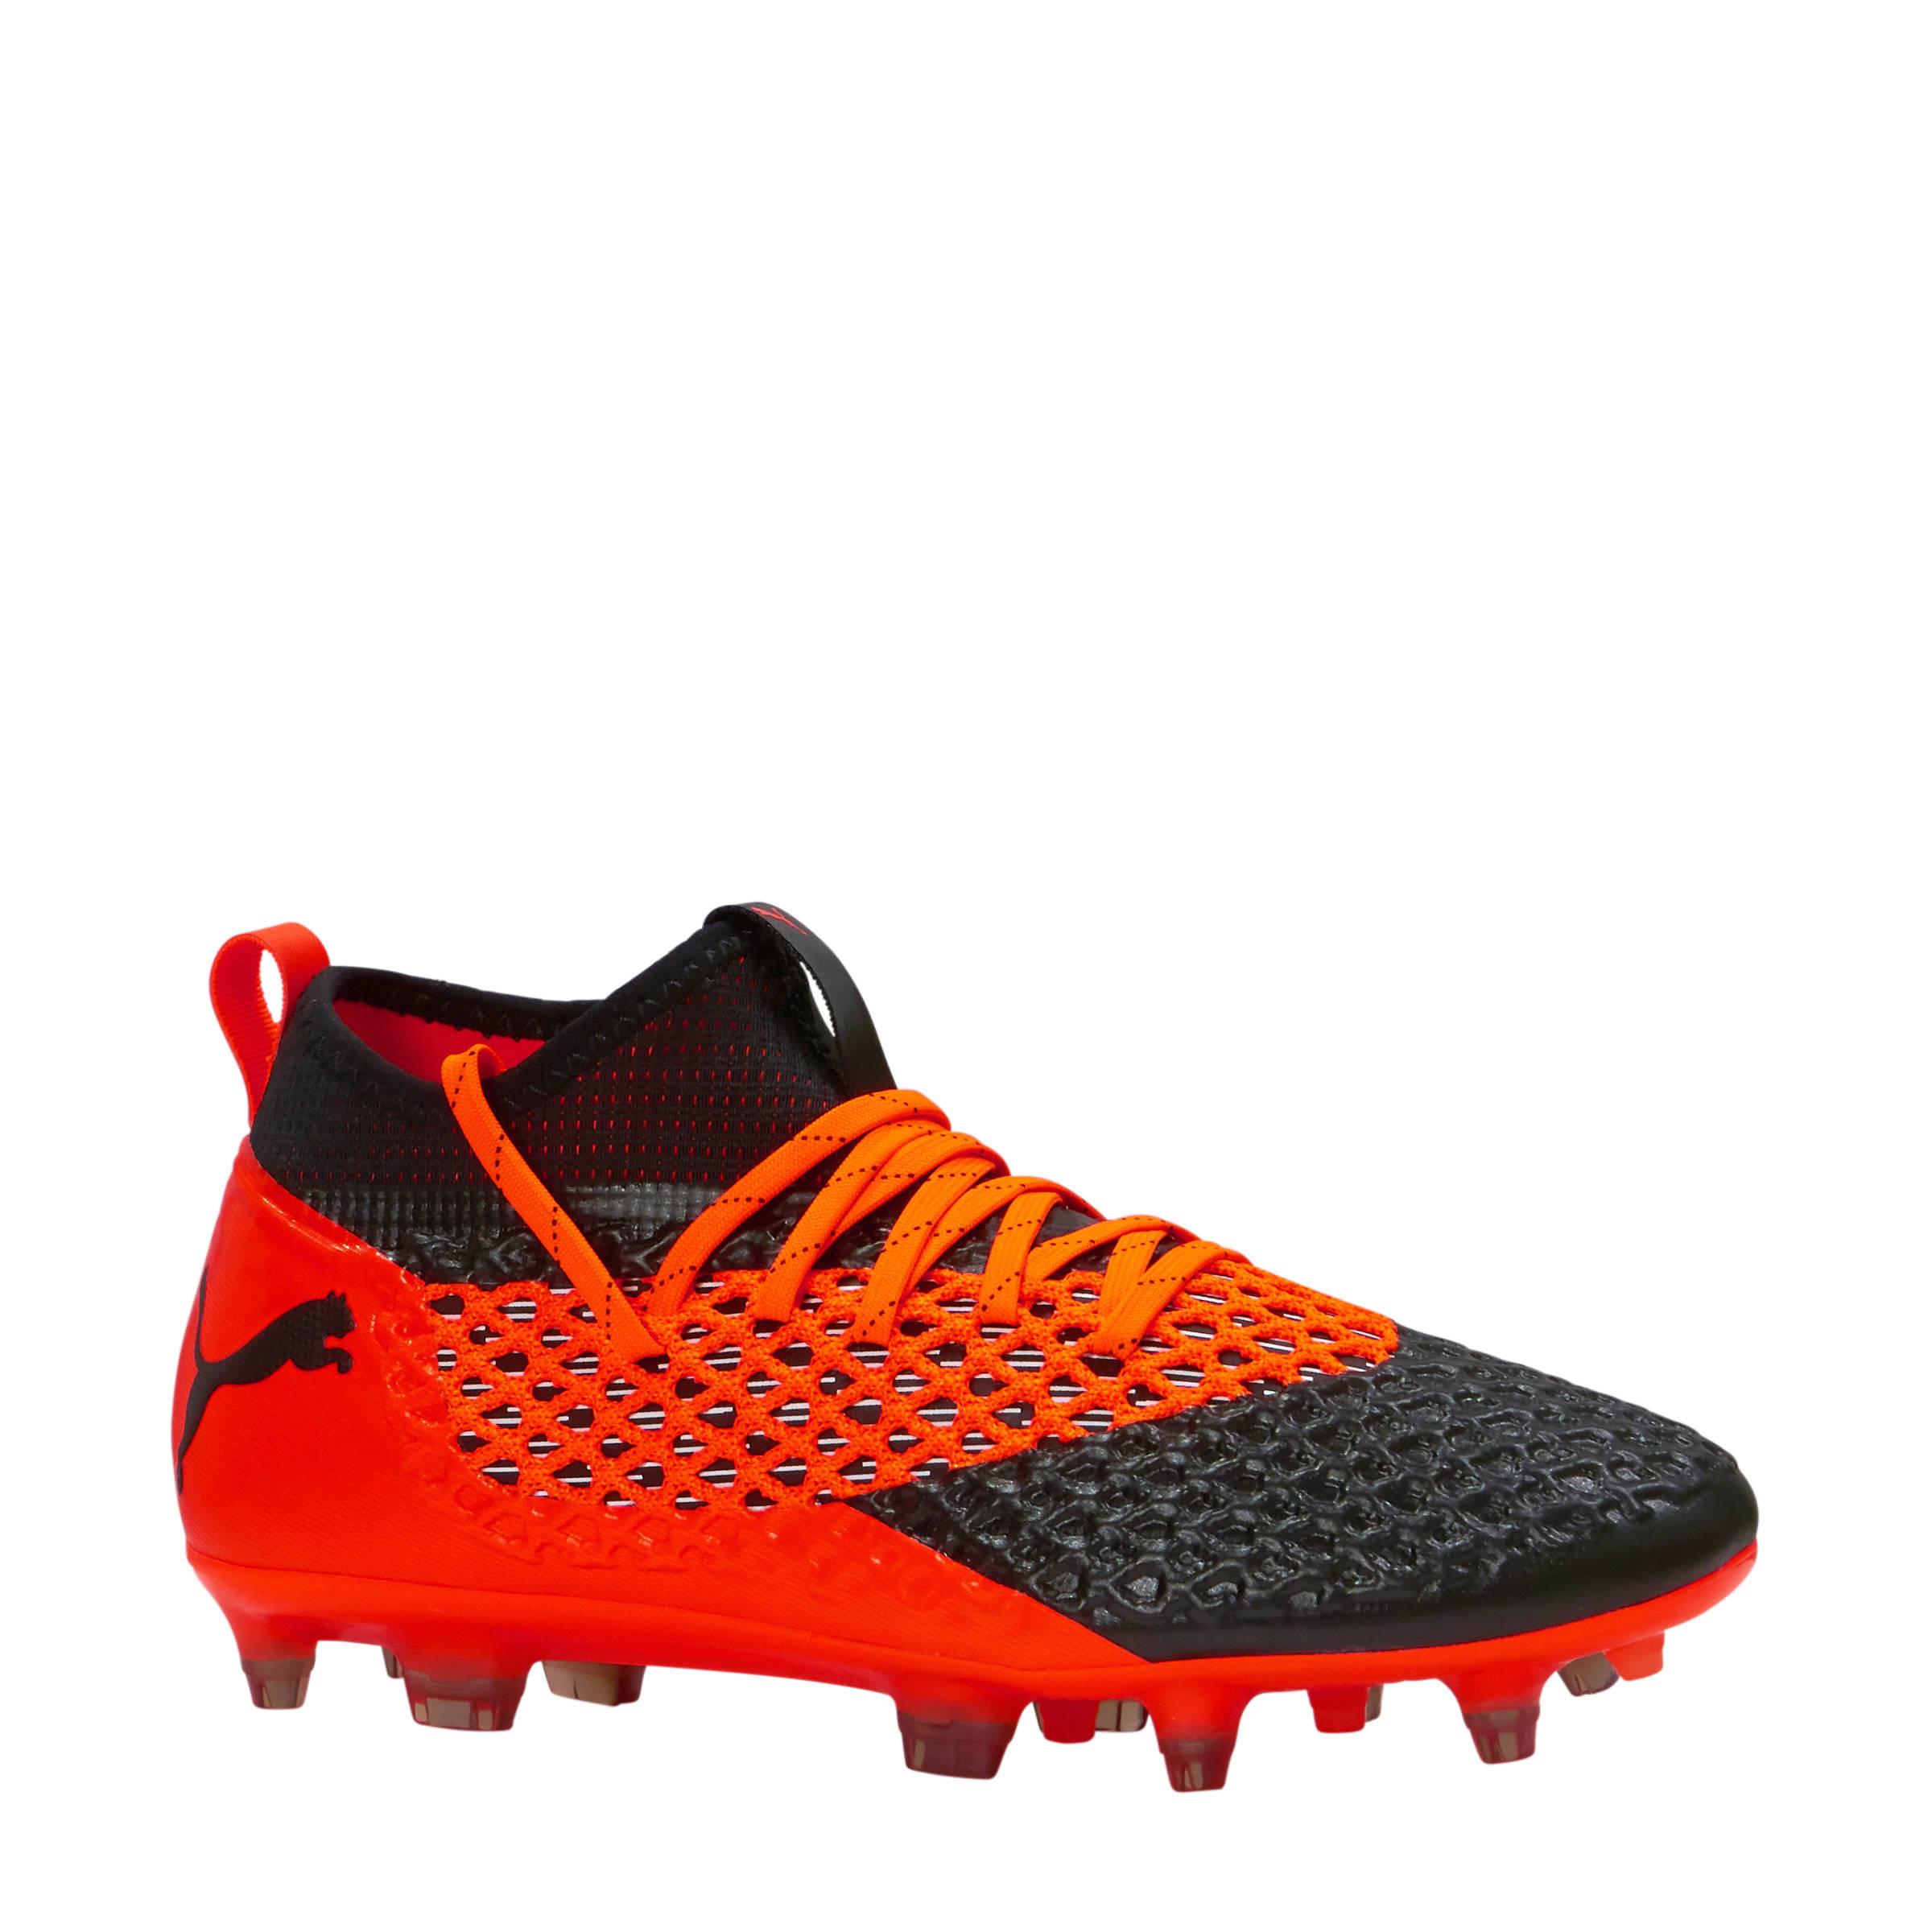 voetbalschoenen Future 2.2 Netfit FG/AG oranje